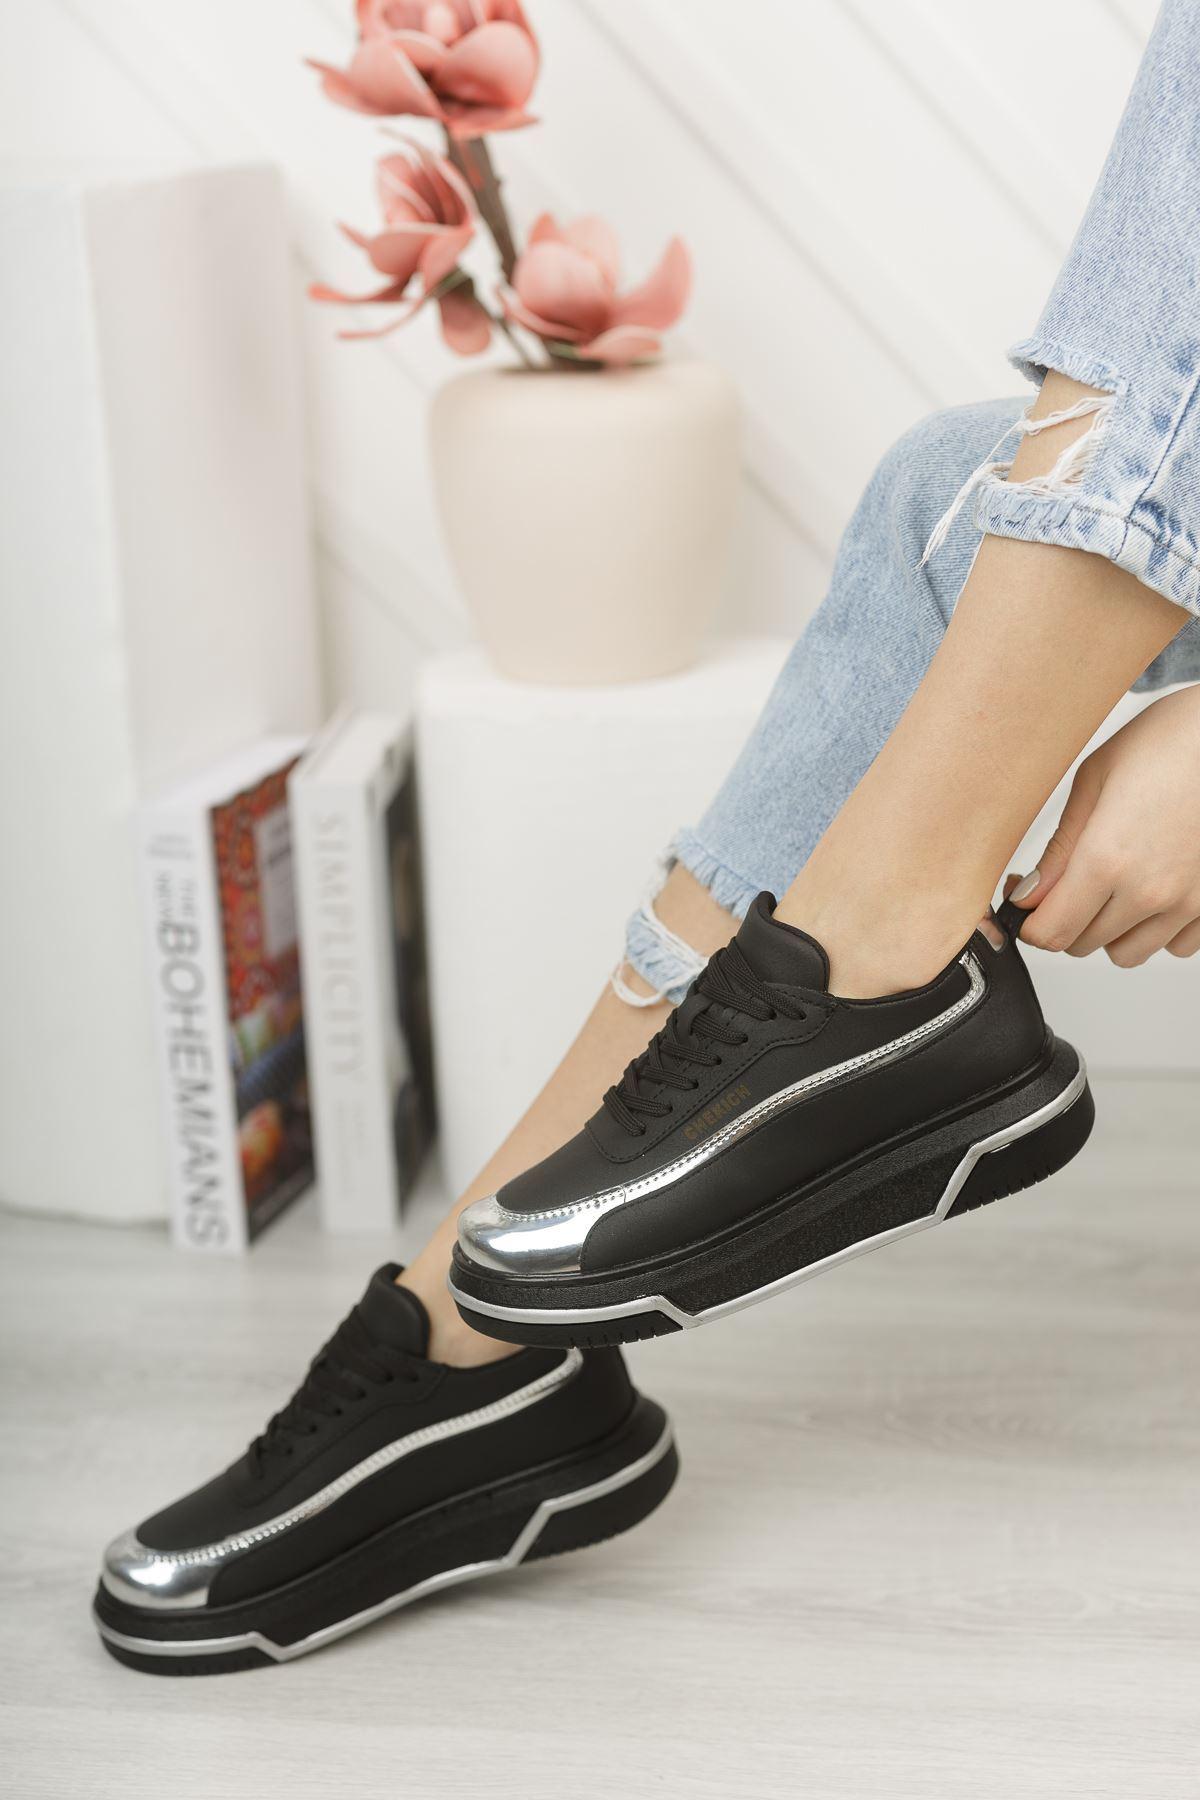 Chekich CH041 ST Kadın Ayakkabı SİYAH/GUMUS